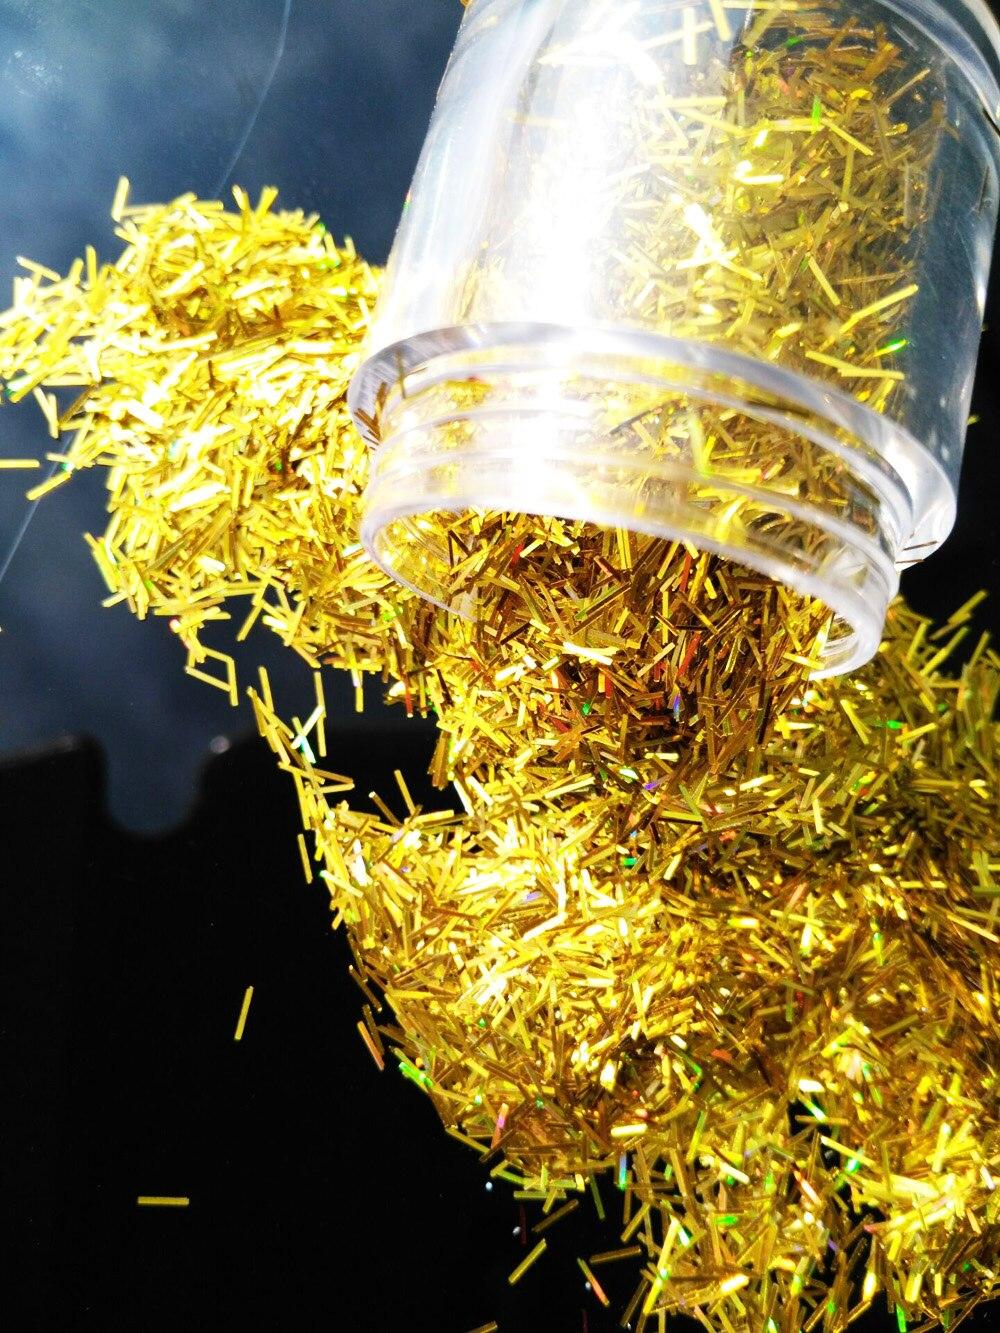 Hu42 Gold Holographic Glitter Bars/nail Art Craft Streifen Kurze Bar Form Farbe 0,2*3 Mm Größe Glitter Für Nagel #10g Glas Tropf-Trocken lb101